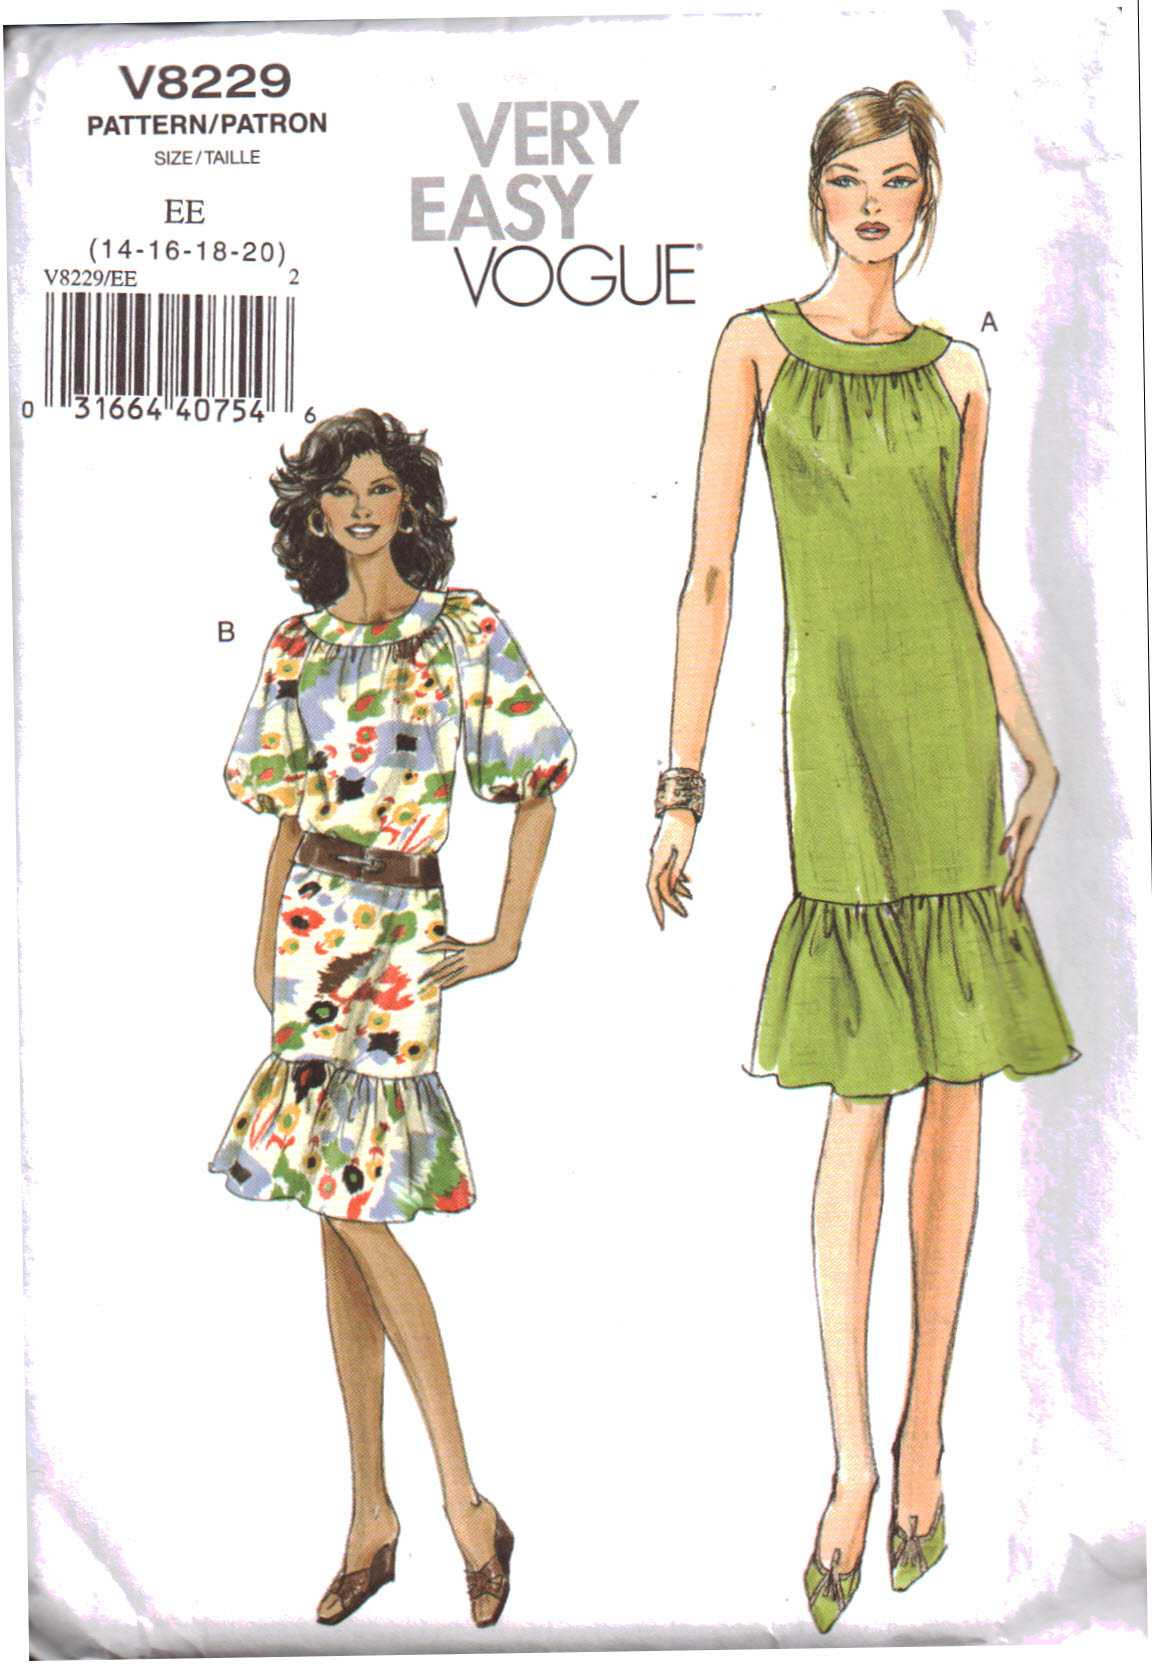 cd6a098b7 Vogue V8229 Misses' / Misses' Petite Dress Size: EE 14-16-18-20 Uncut Sewing  Pattern